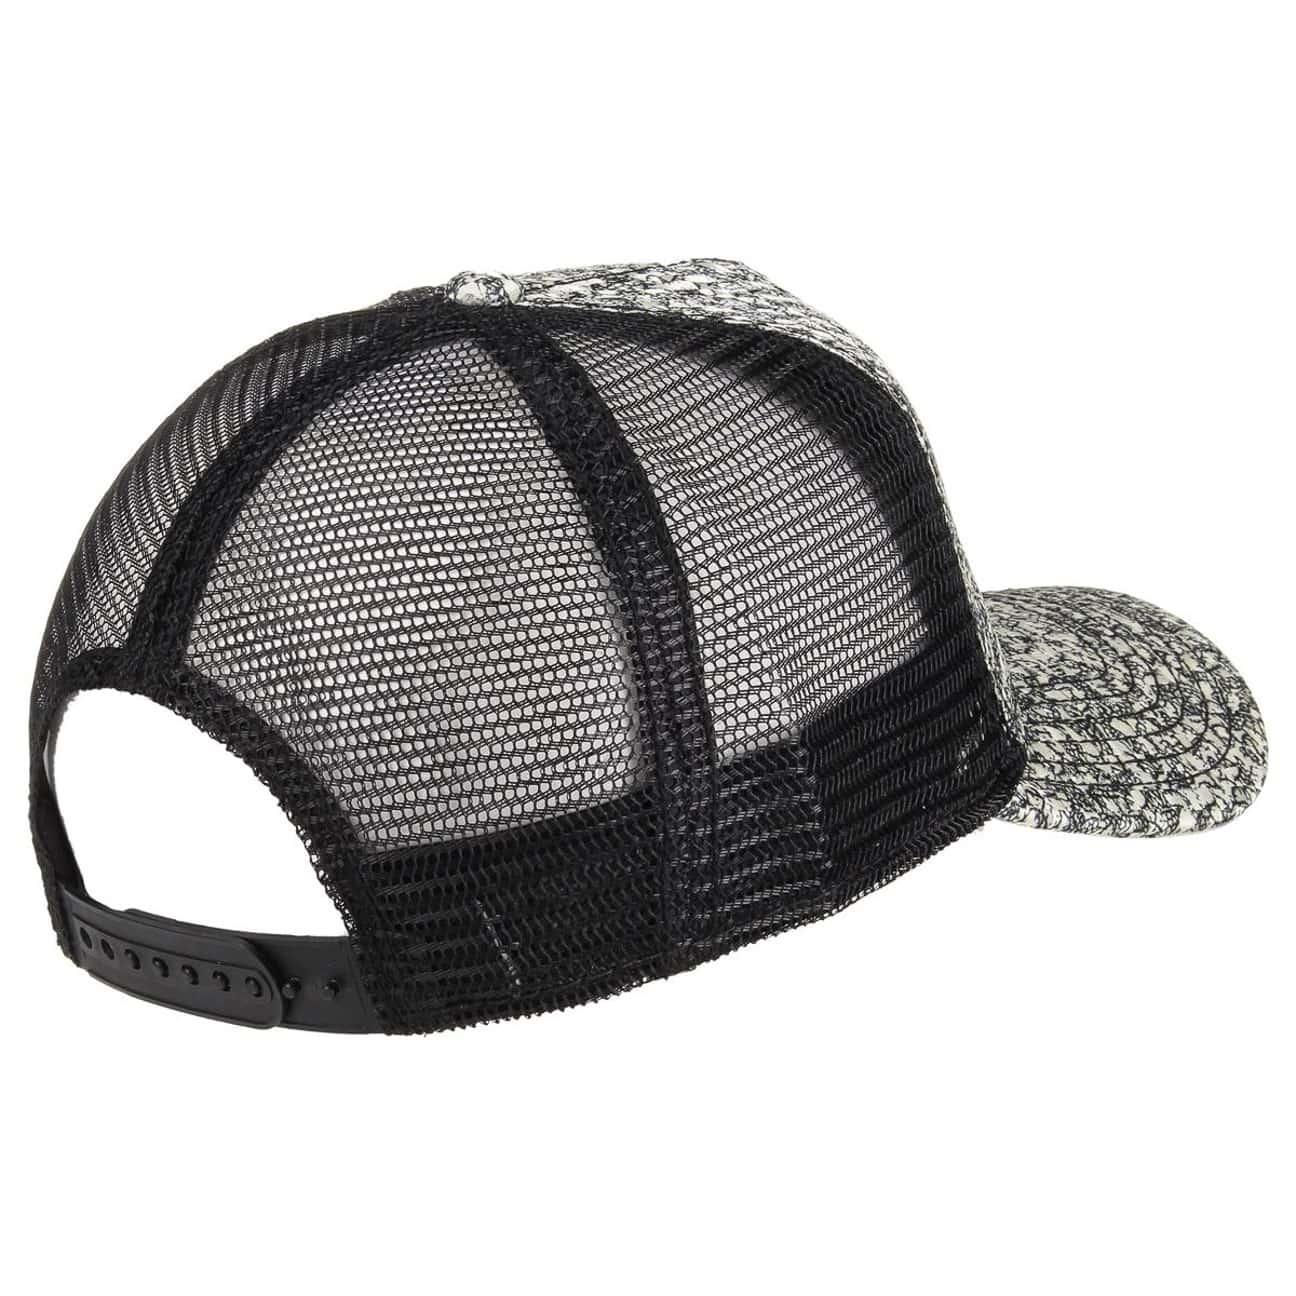 hft shifted trucker cap 2 by djinns gbp 17 95 hats. Black Bedroom Furniture Sets. Home Design Ideas